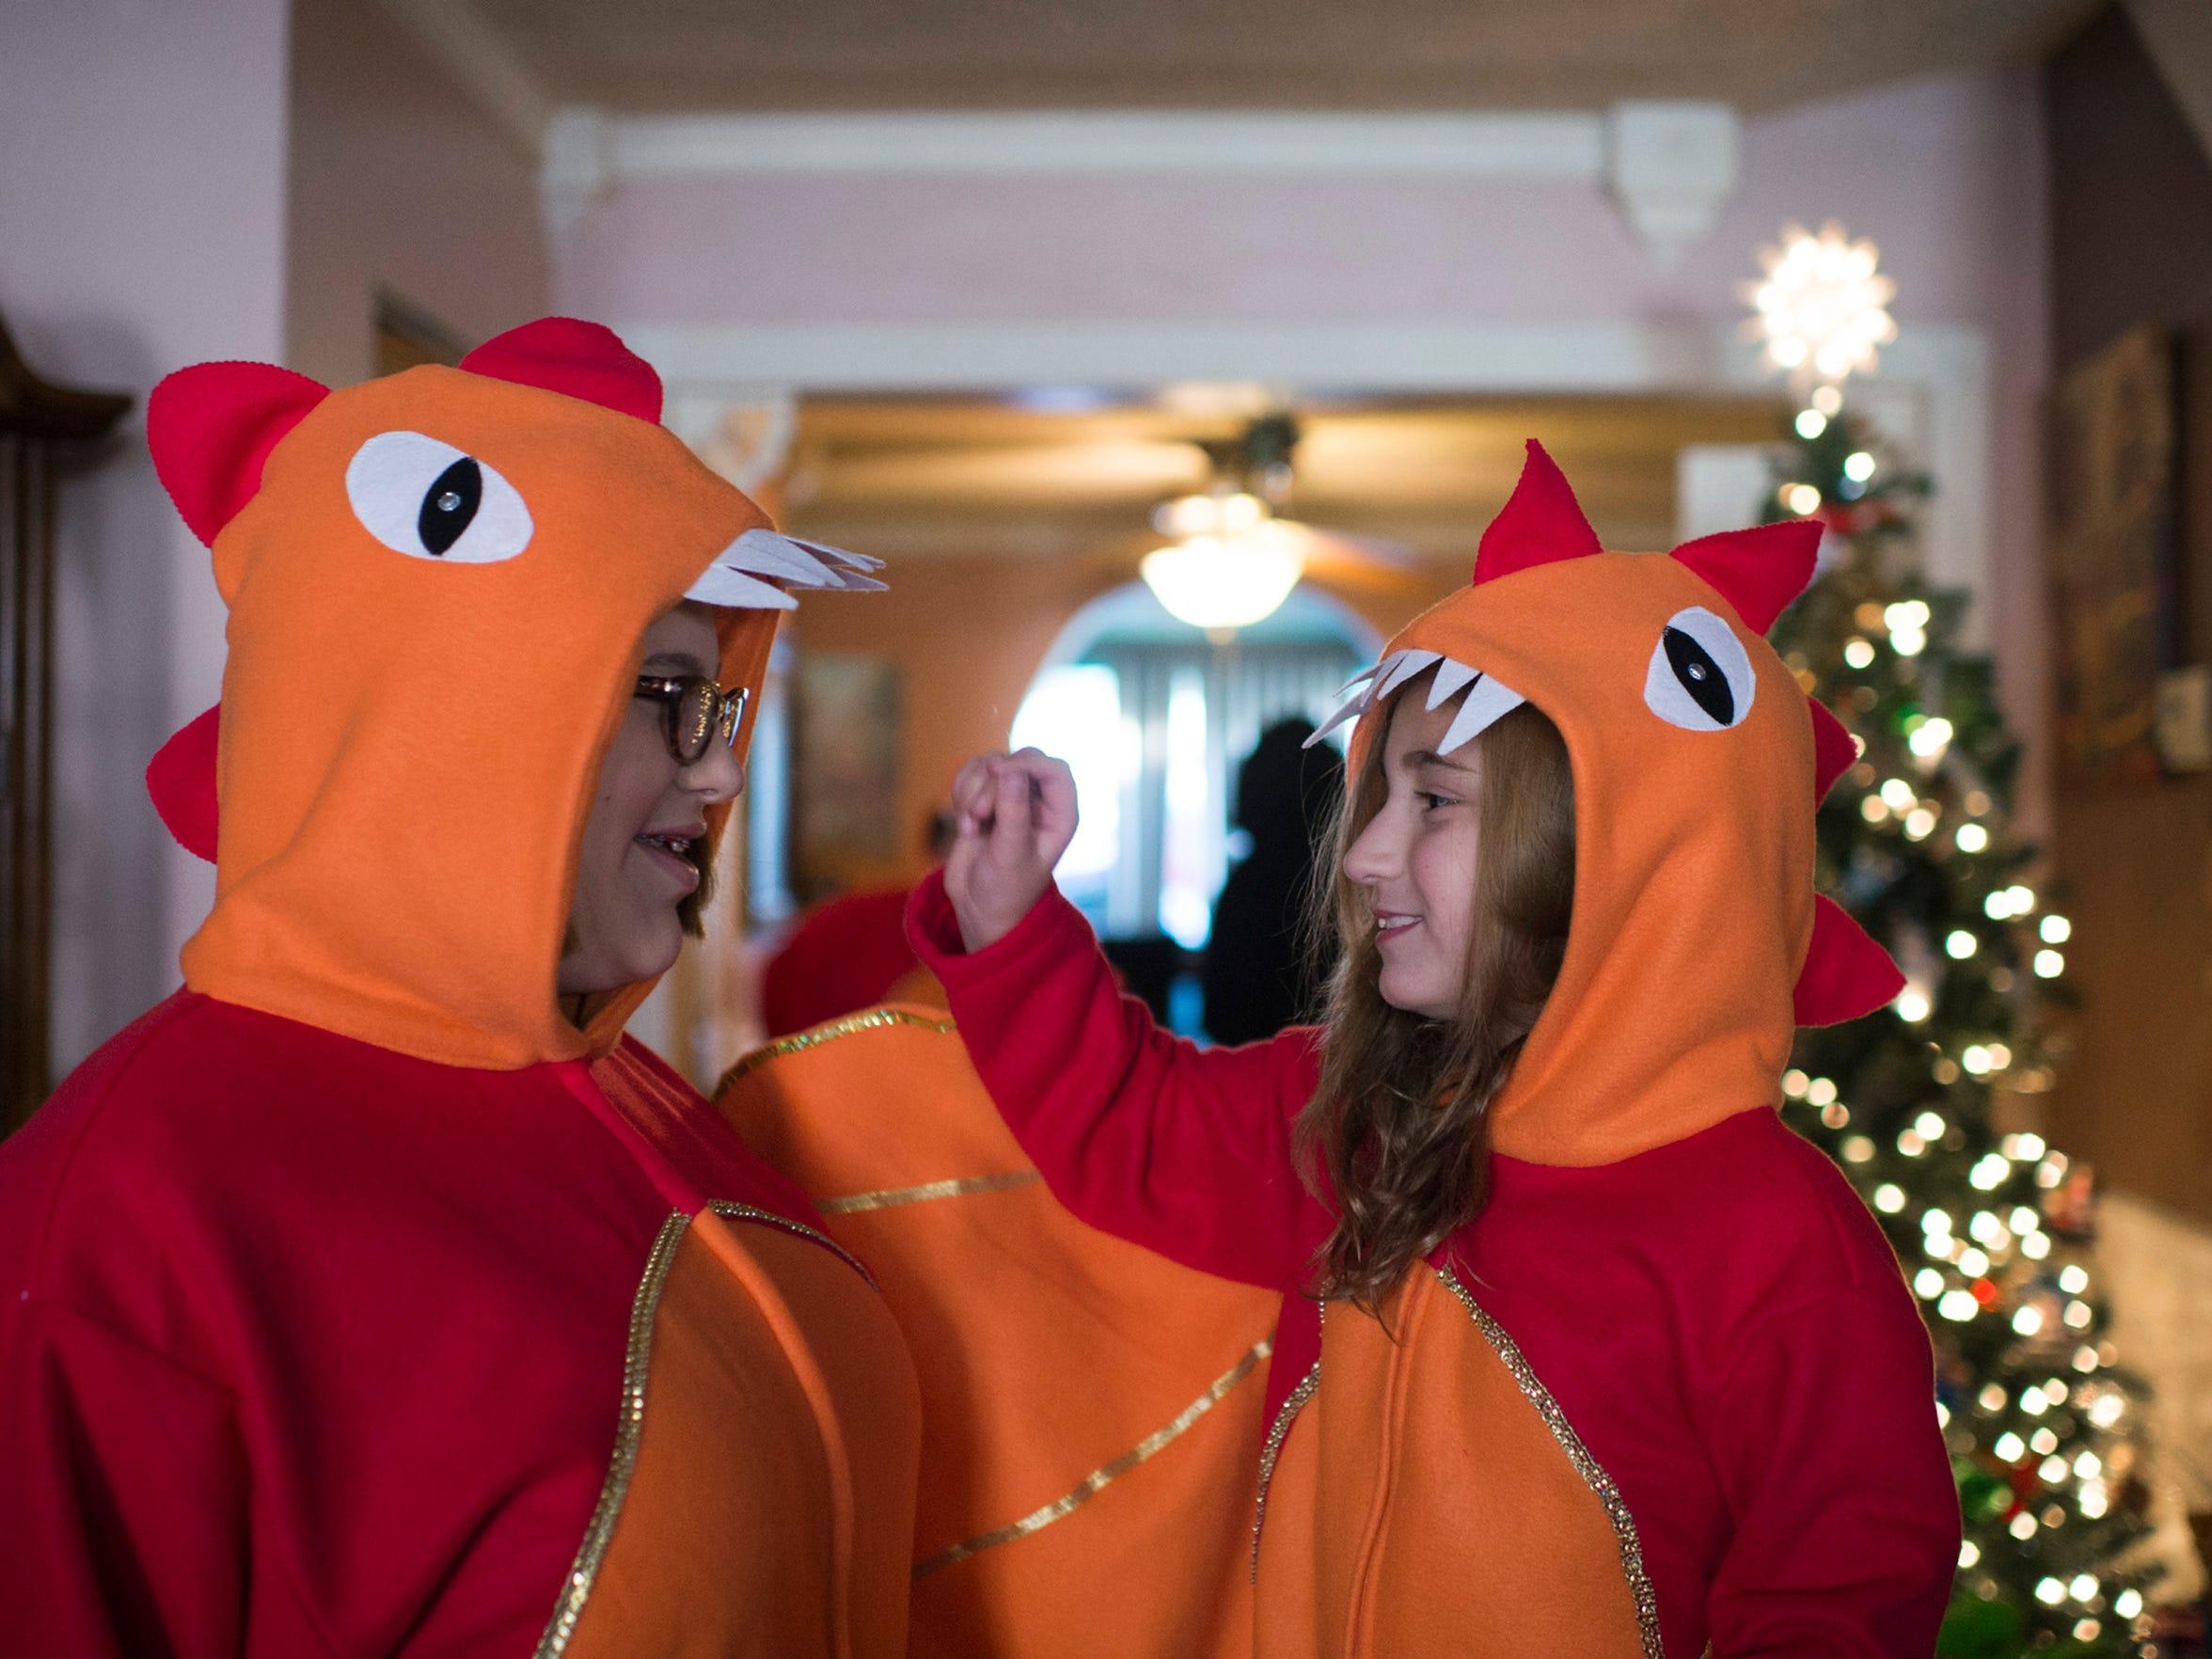 Sophia Stagliano, 8, right, helps Justina Russino, 18, adjust her dragon costume.